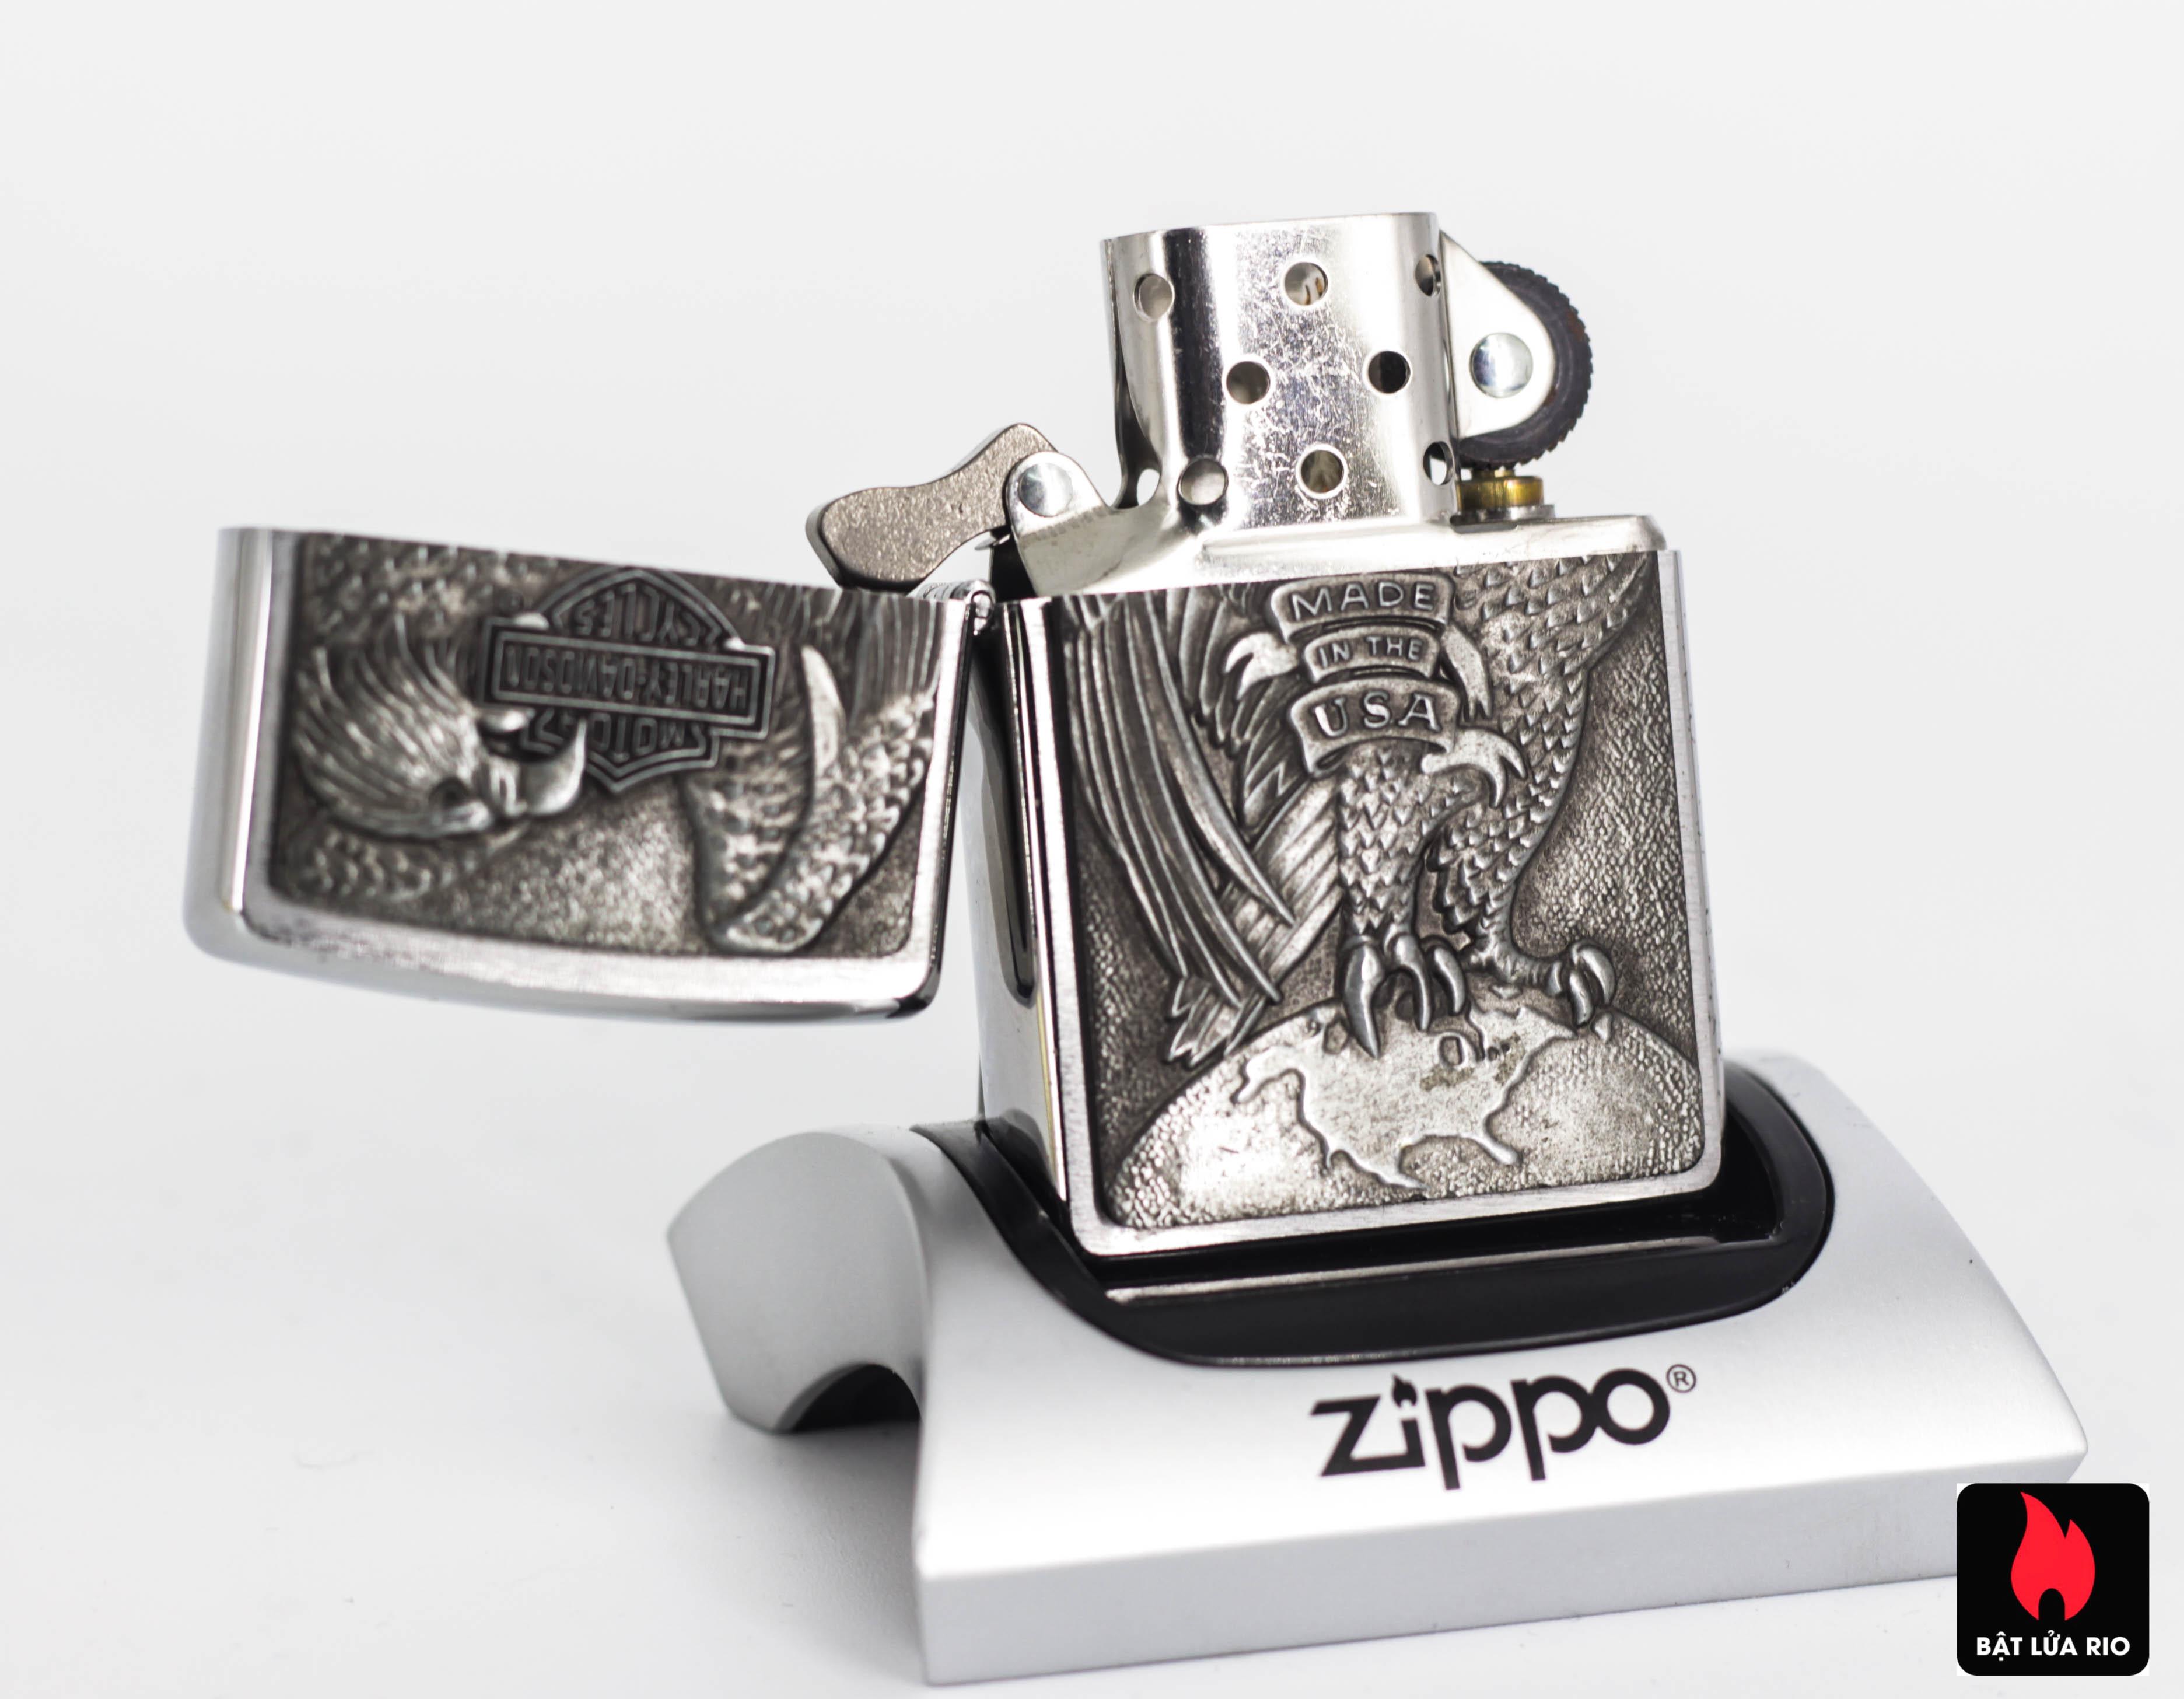 Zippo 2008 - Zippo Made in the USA Eagle and Globe Emblem 6